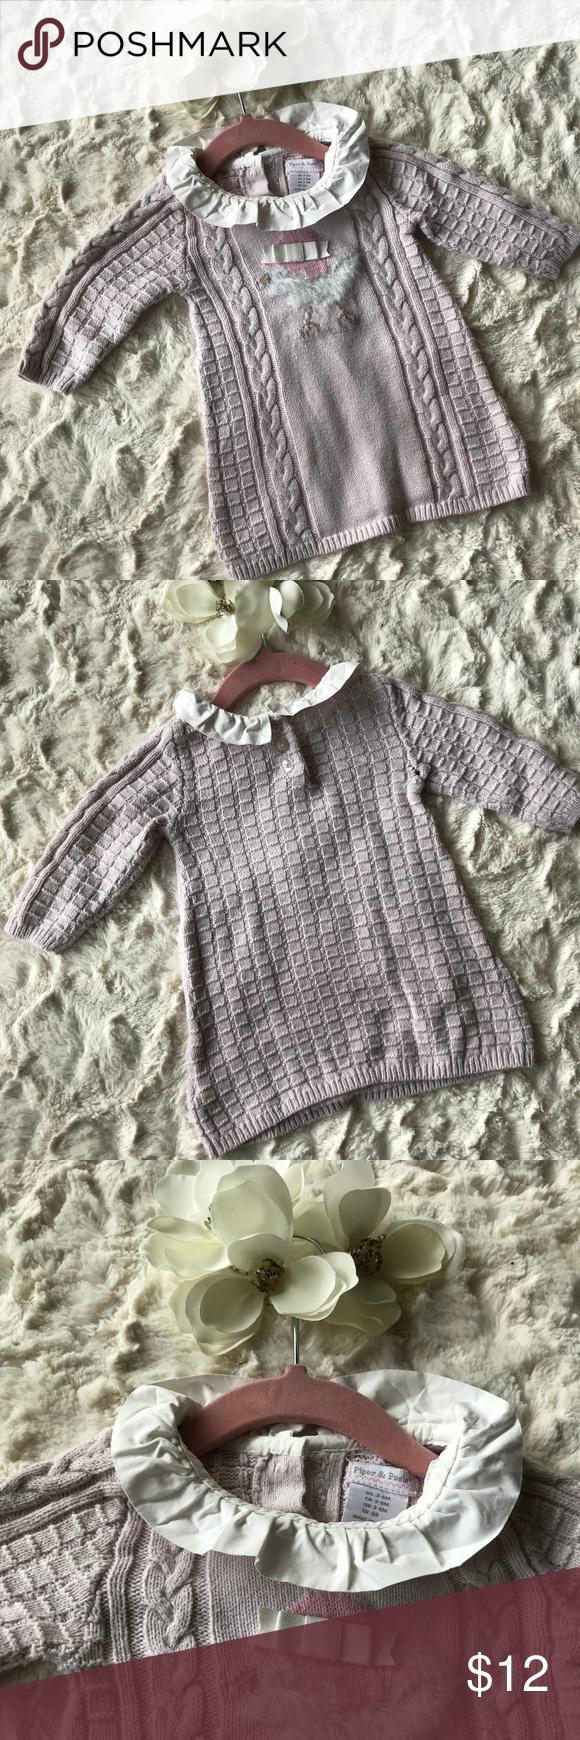 439bdaa4d Baby Girl sweater dress - Piper   Posie